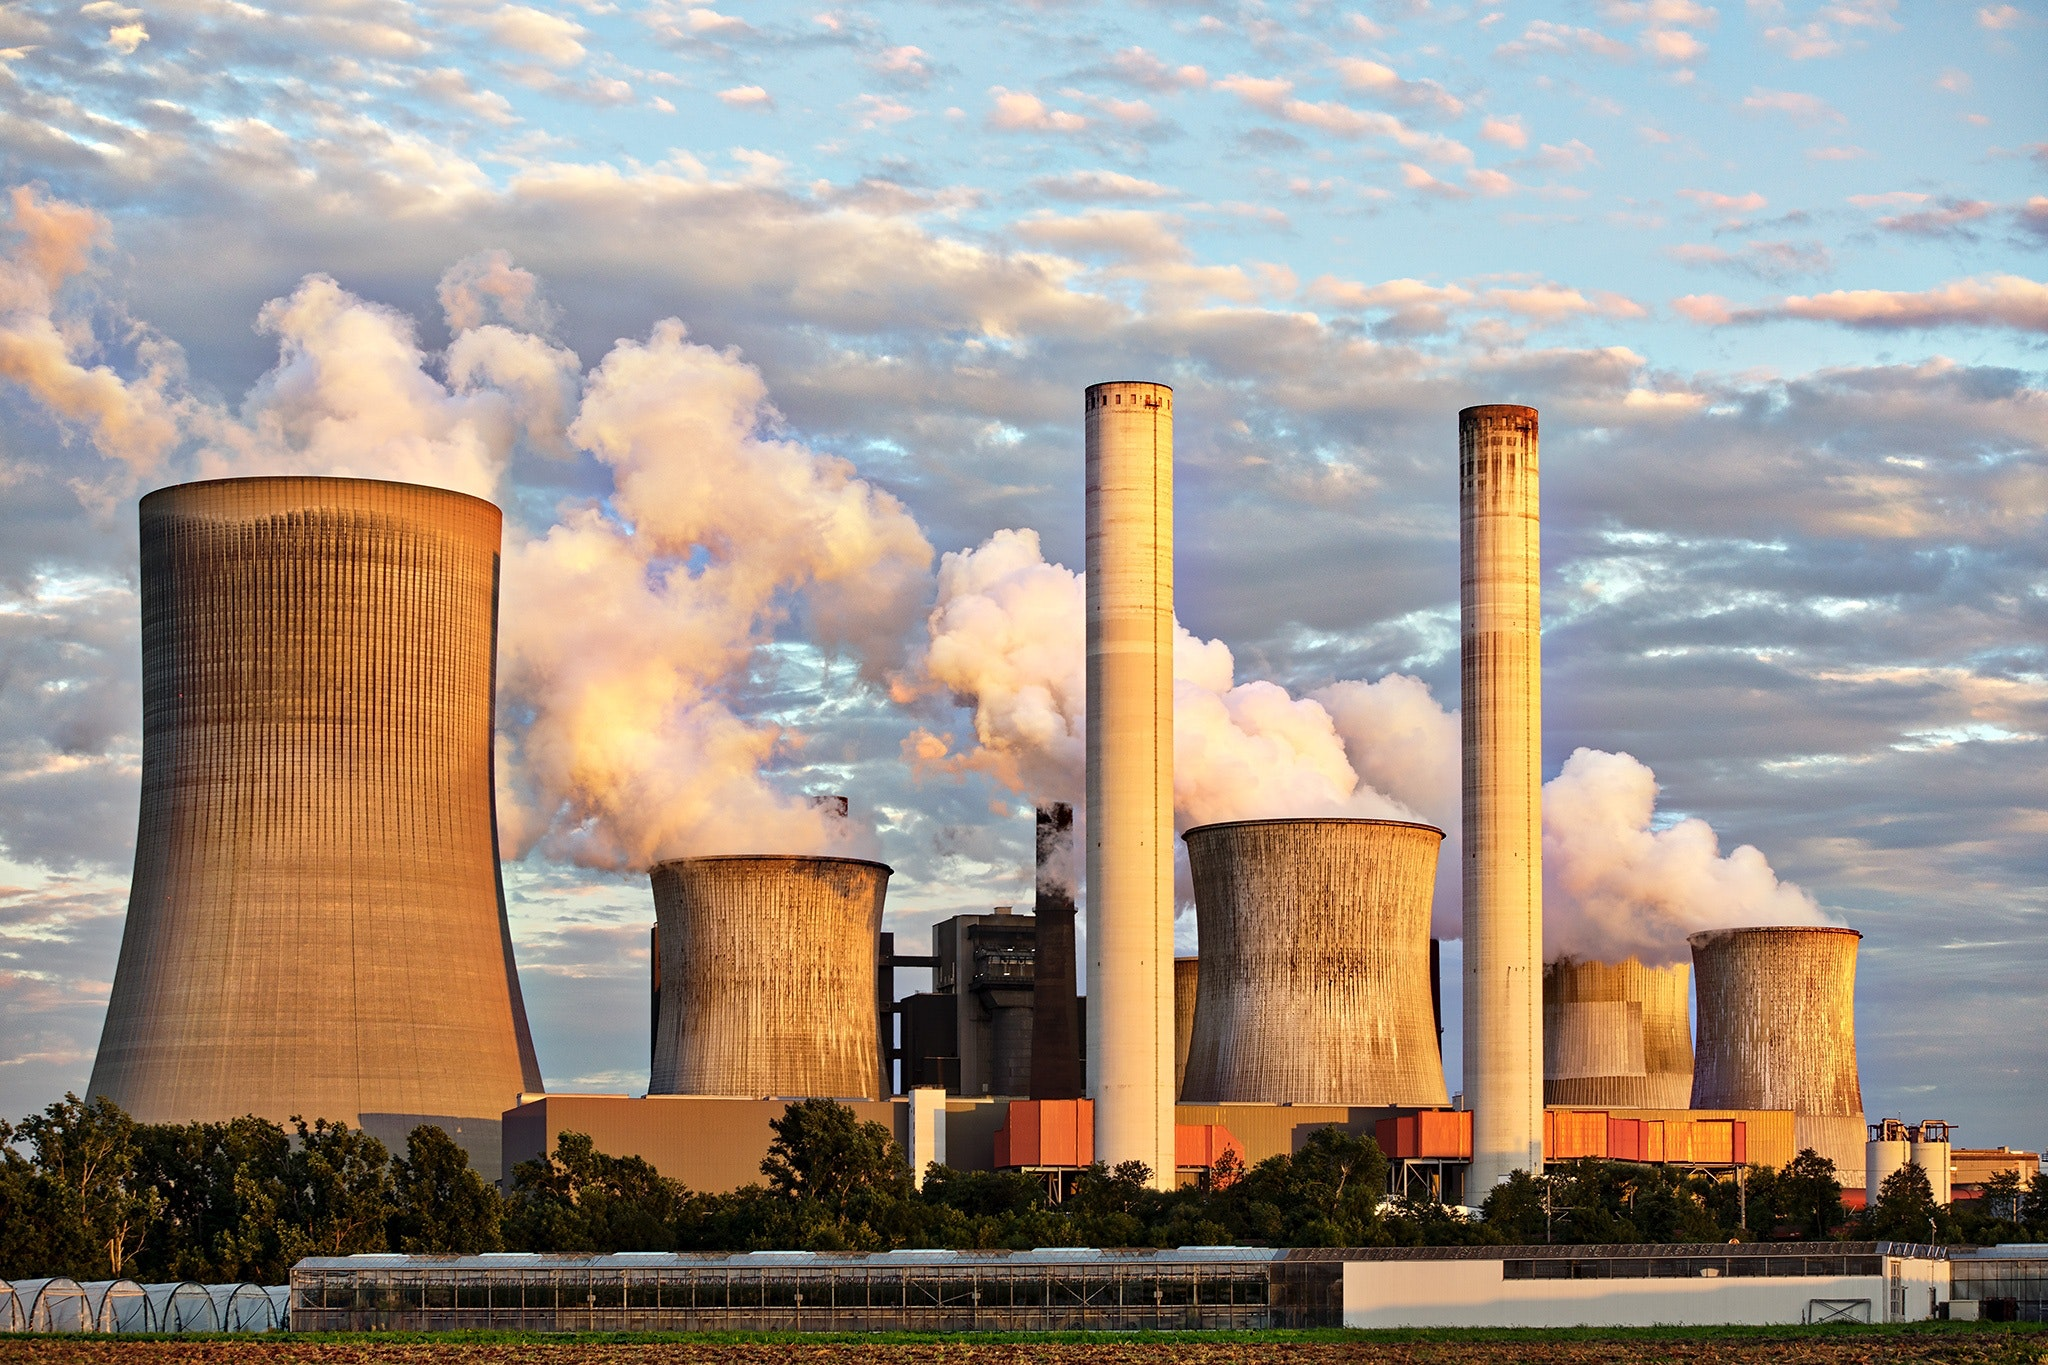 Alemania estima recortar sus emisiones 65% para 2030